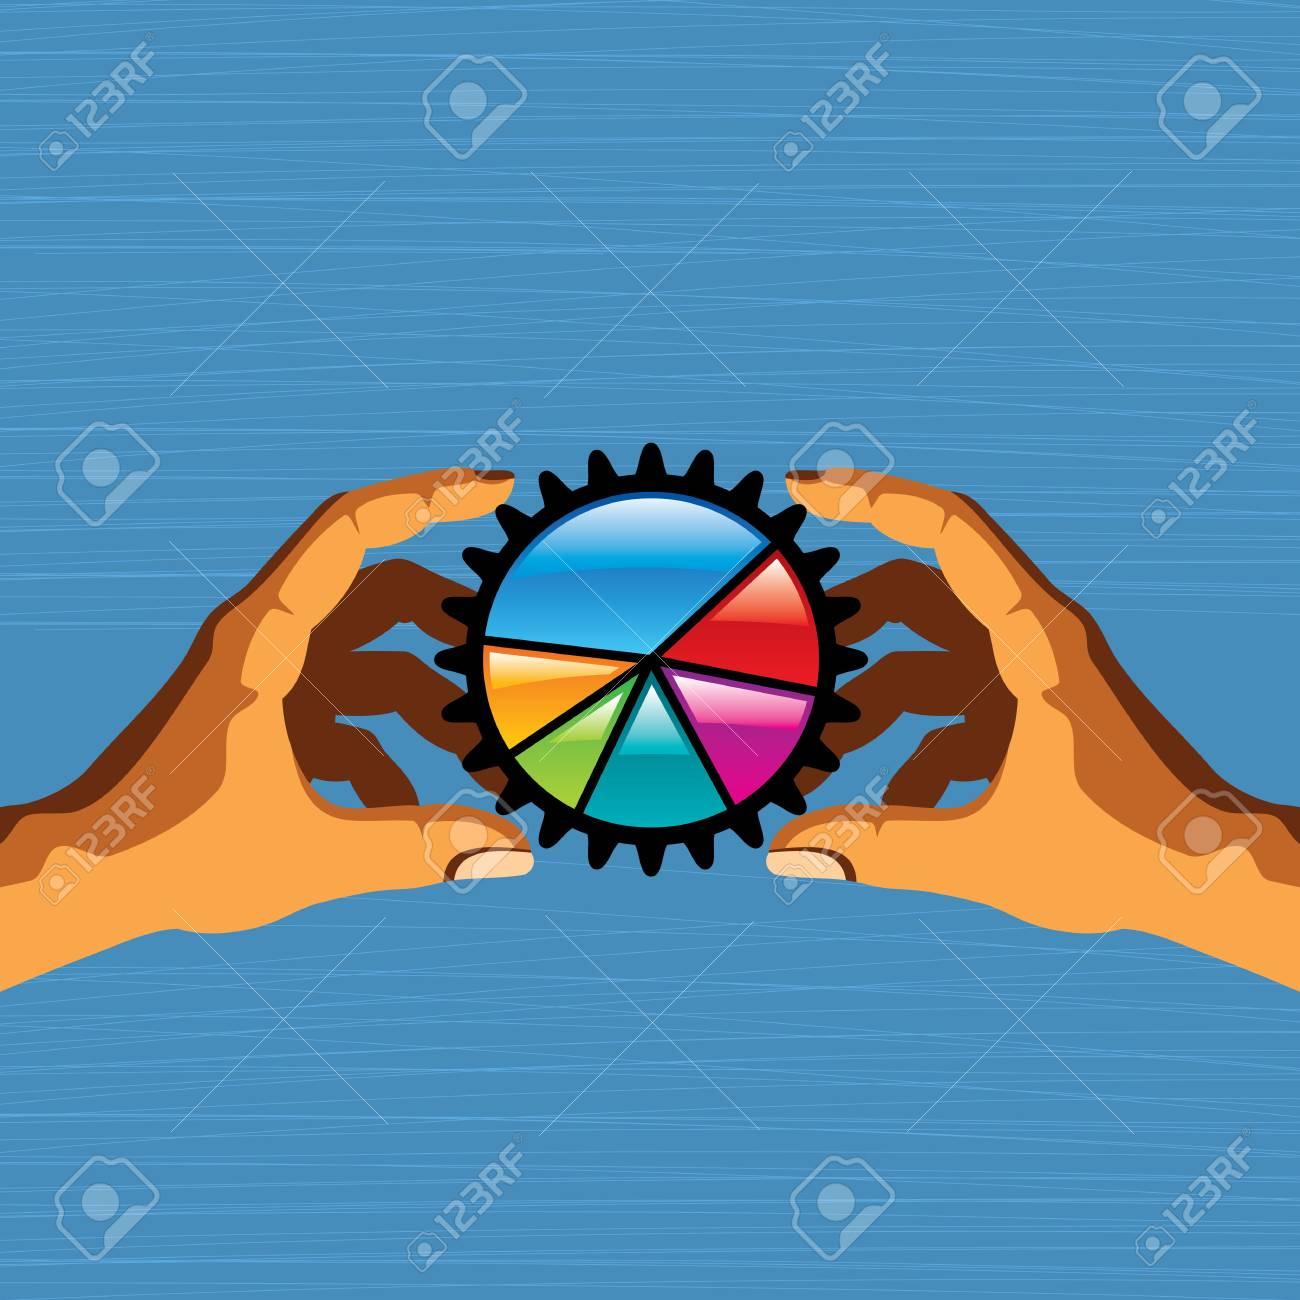 pie chart holding hands, successful teamwork concept Stock Vector - 17084643